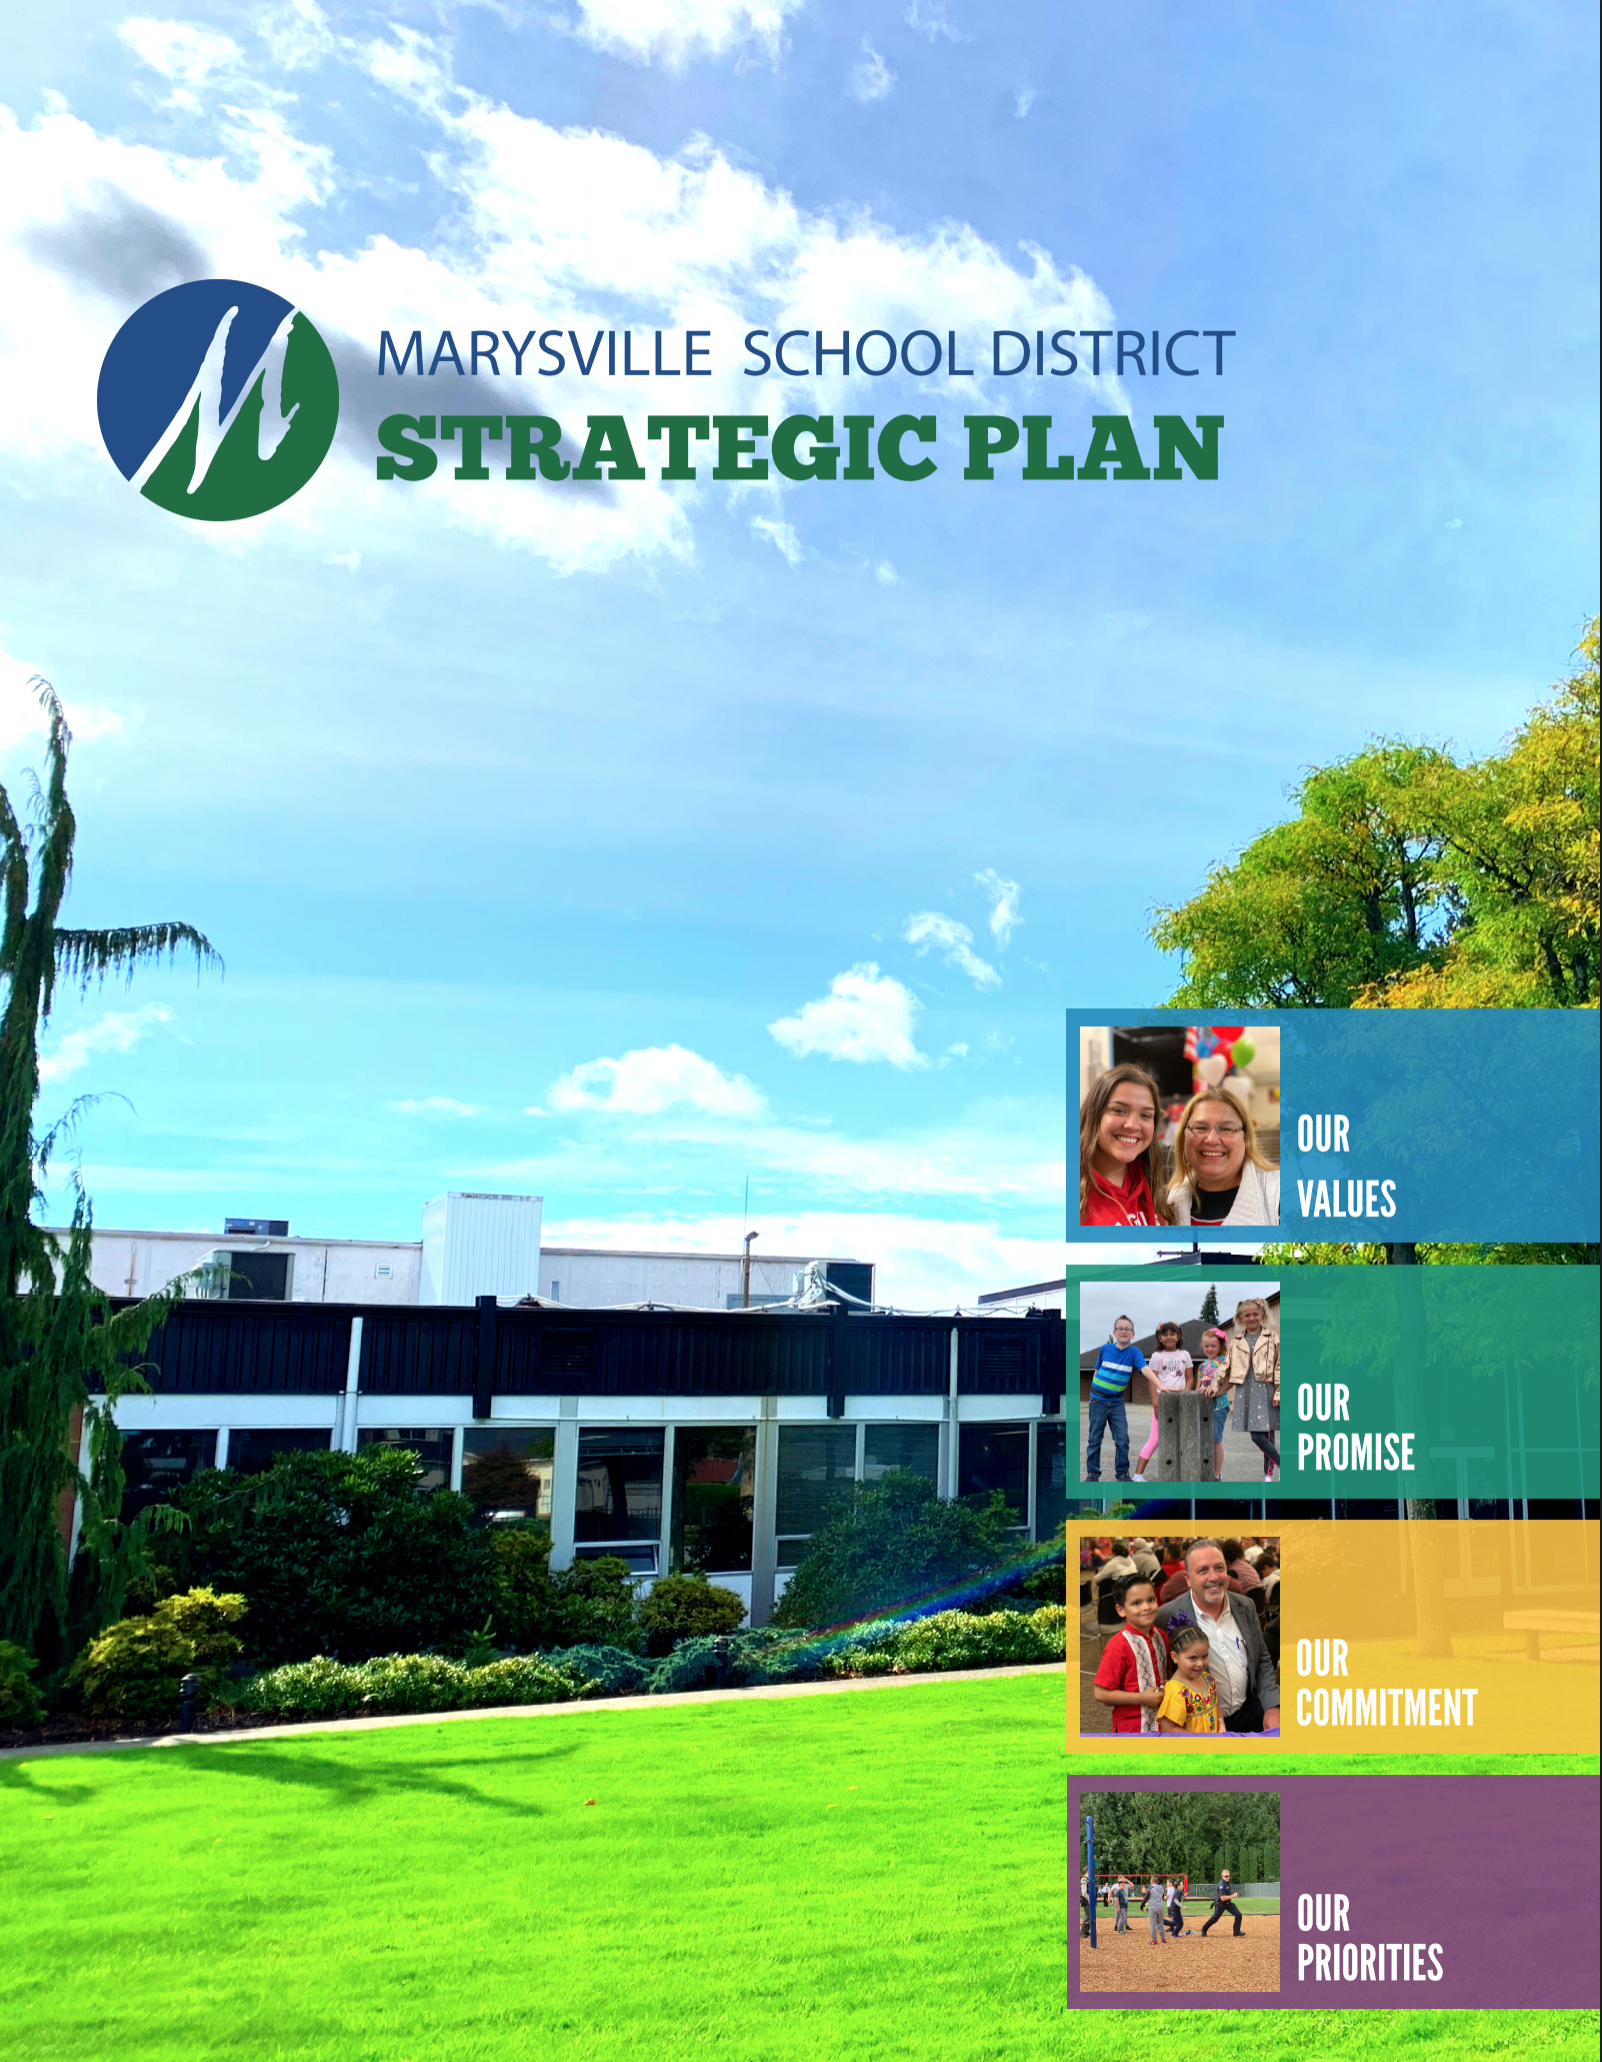 Marysville School Distrcit Strategic Plan